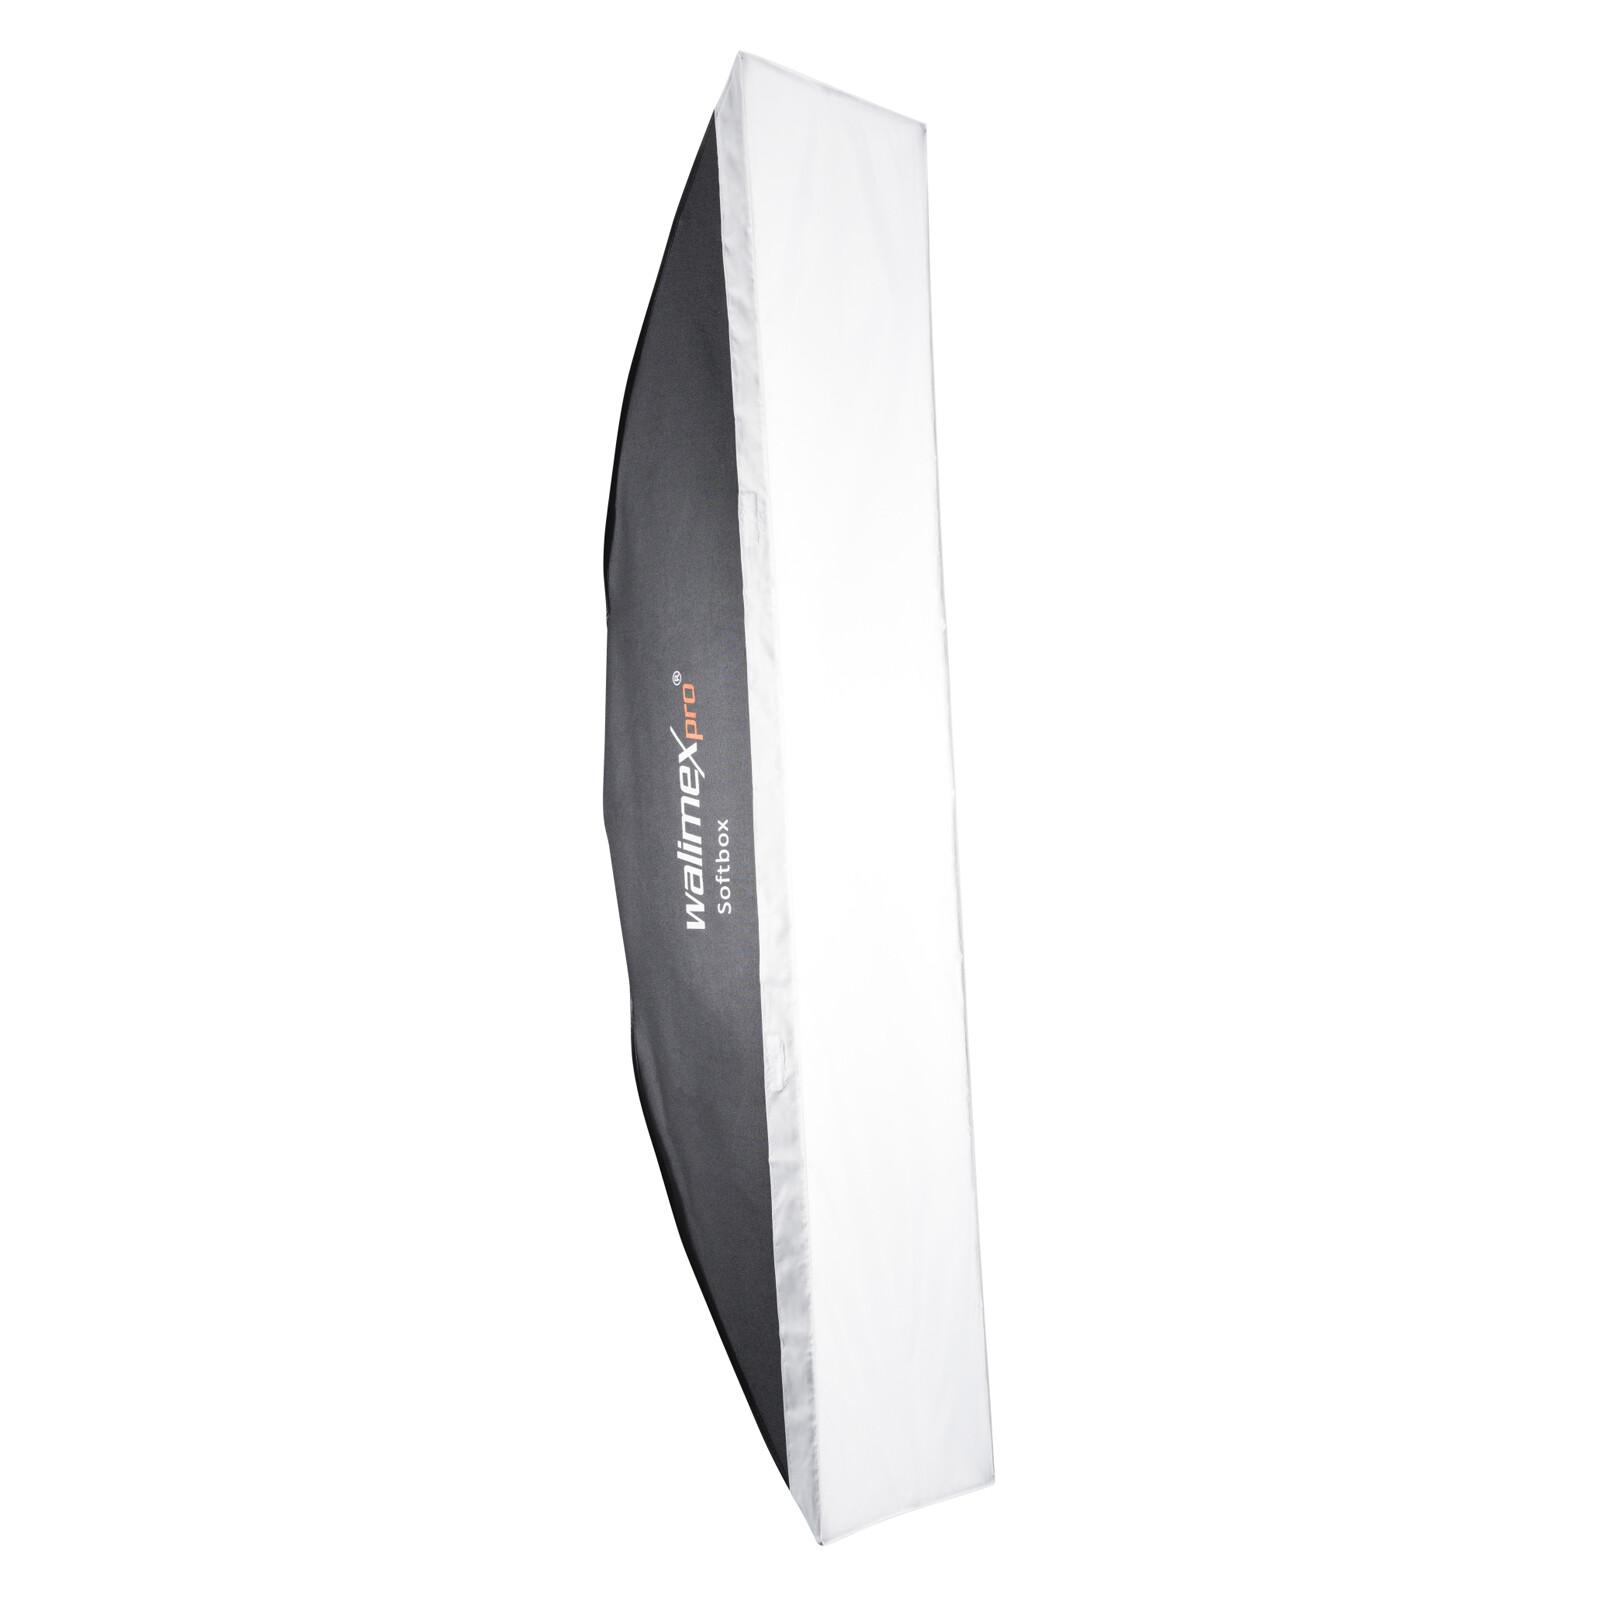 walimex pro Striplight 40x180cm für Multiblitz V